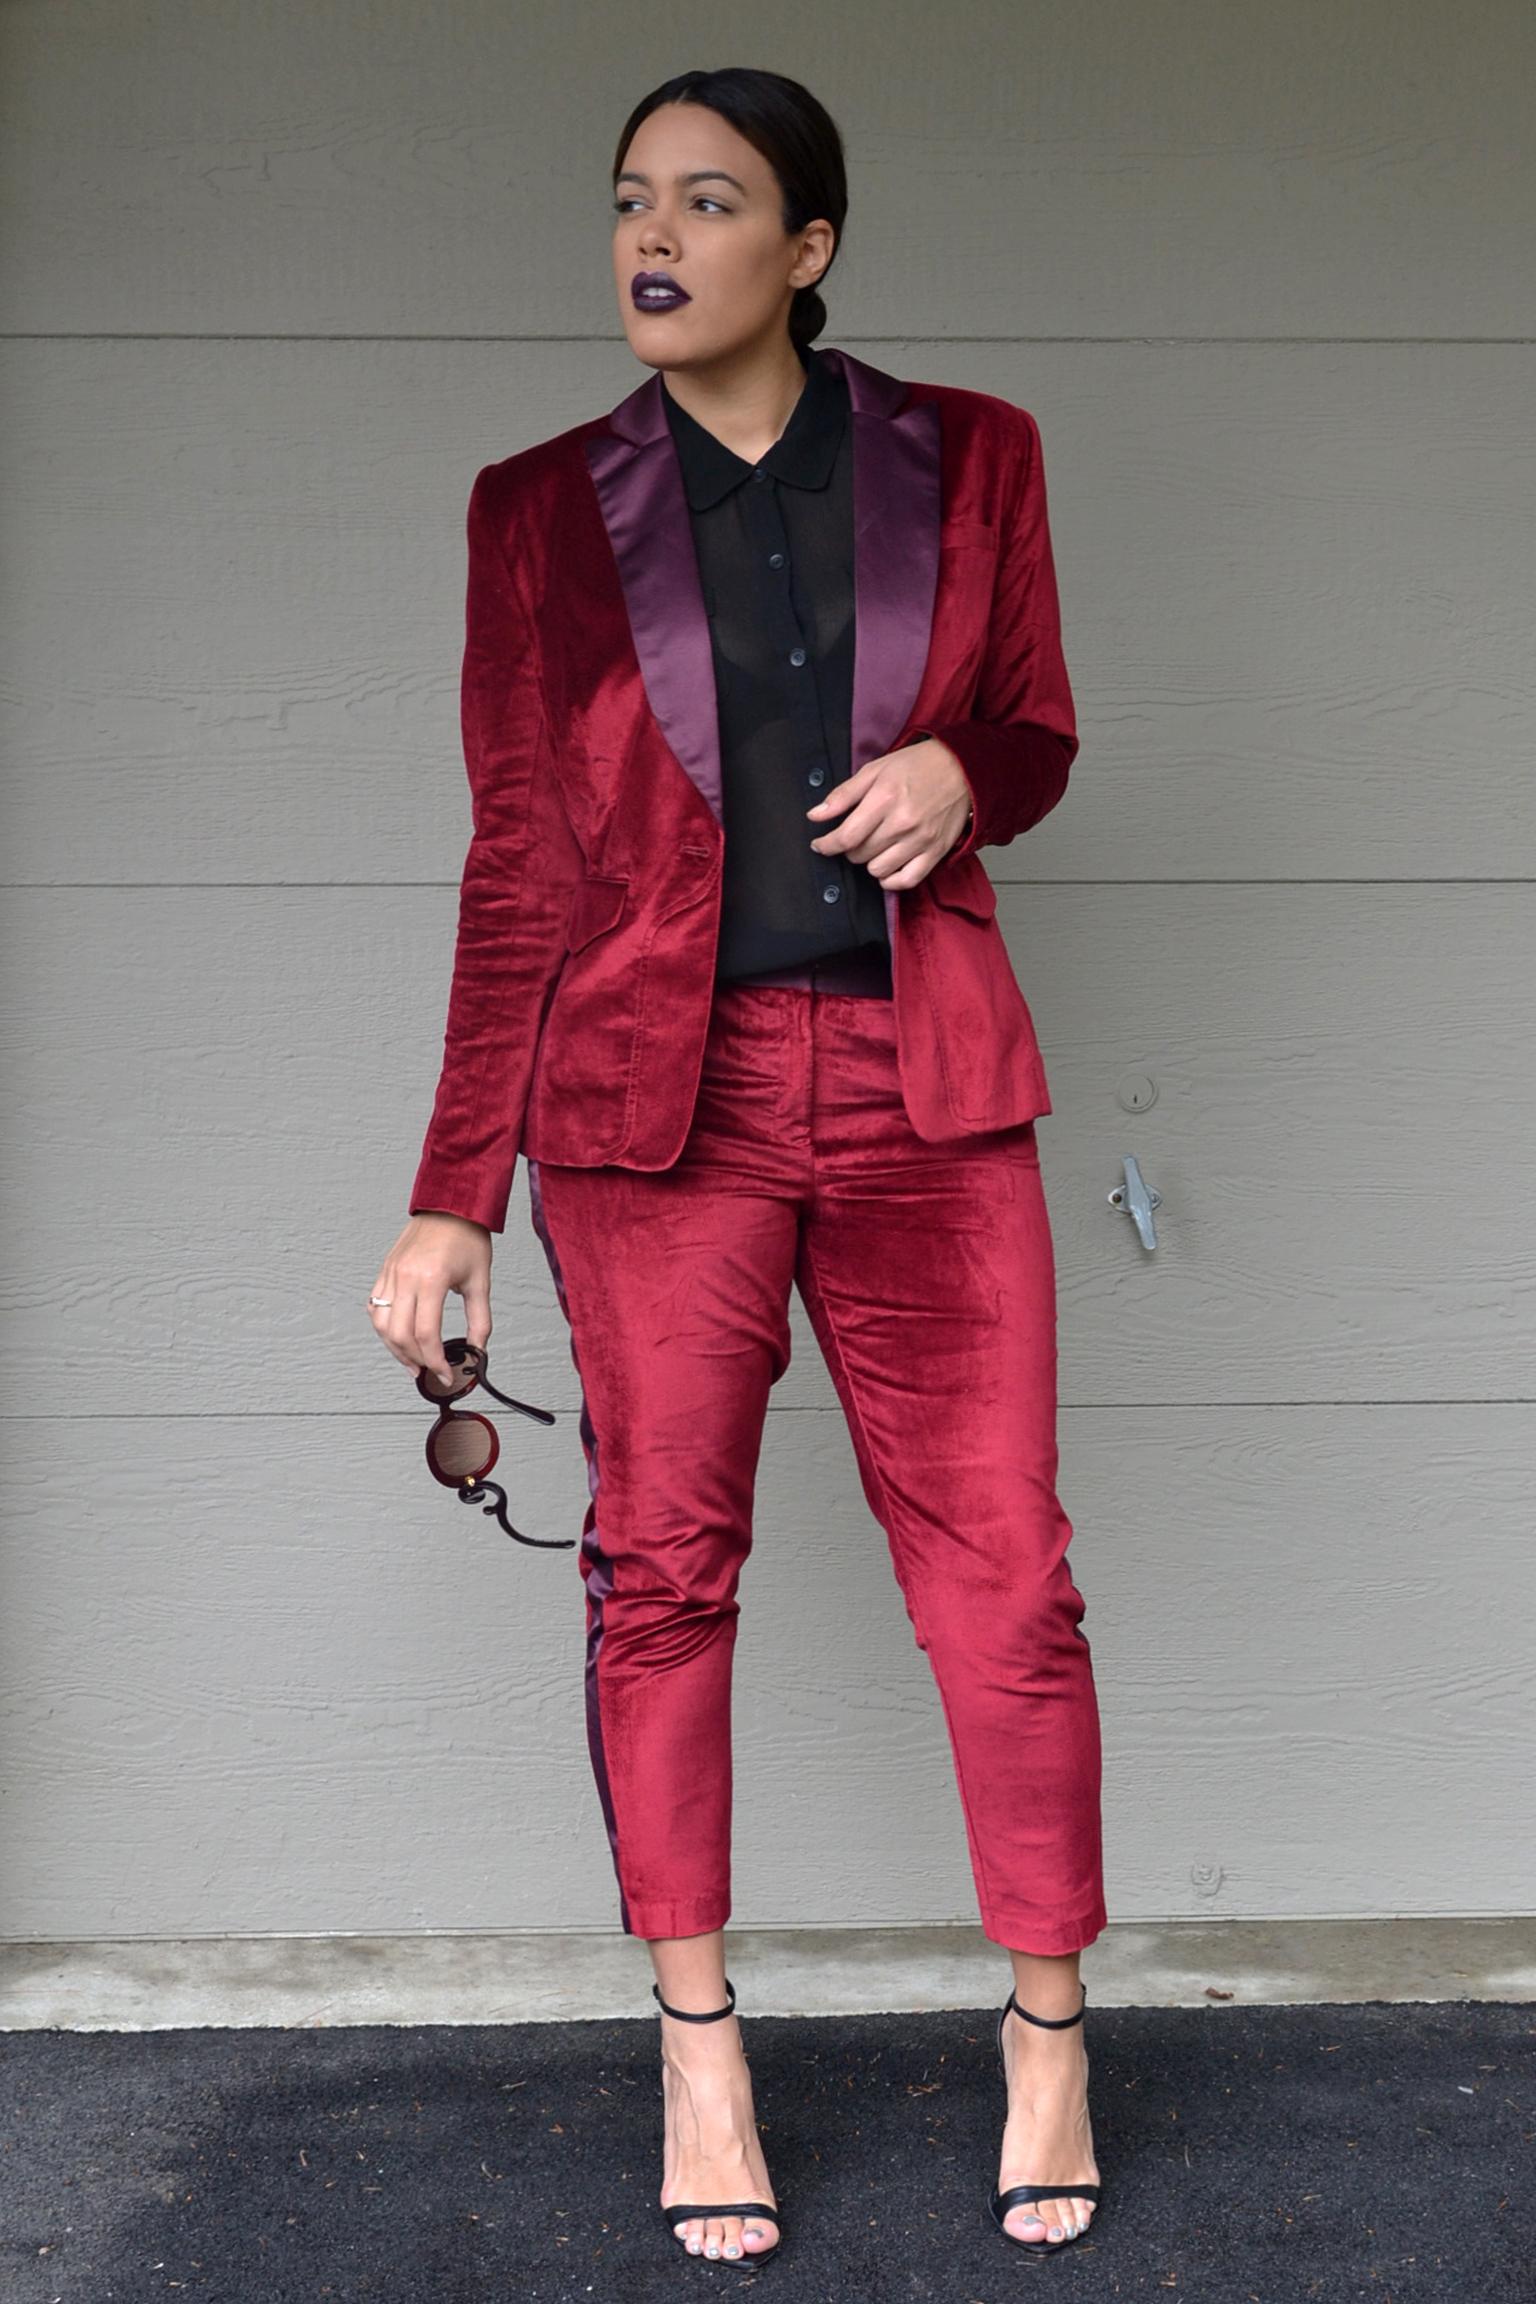 how-to-wear-altuzarra-for-target-red-velvet-blazer-and-pants-suit-set-prada-baroque-sunglasses-forever-21-black-chiffon-blouse-zara-ankle-strap-heels.jpg